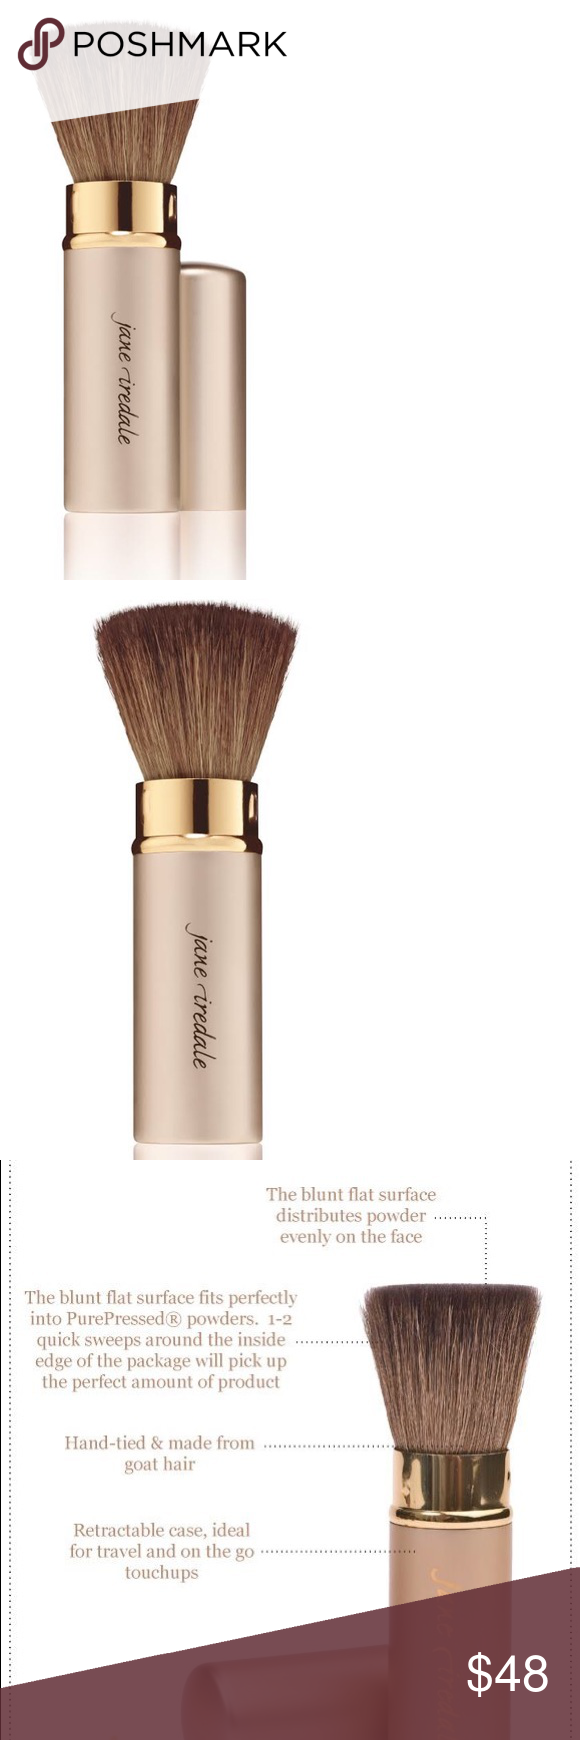 HP💕Retractable Handi Makeup Brush Jane Iredale Boutique